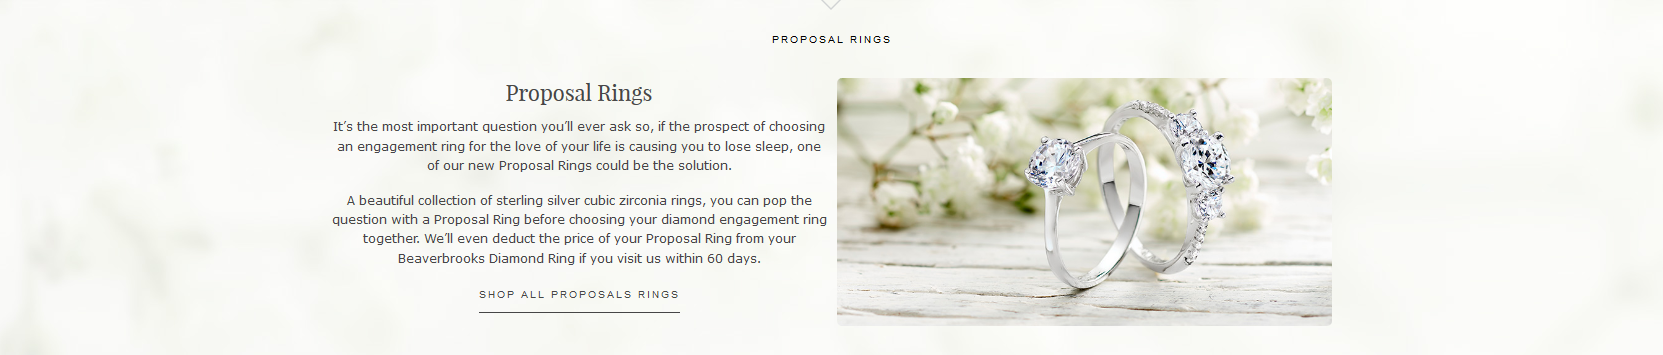 Screenshot-2018-2-3 Engagement Ring Buying Guide Beaverbrooks Beaverbrooks the Jewellers(6).png